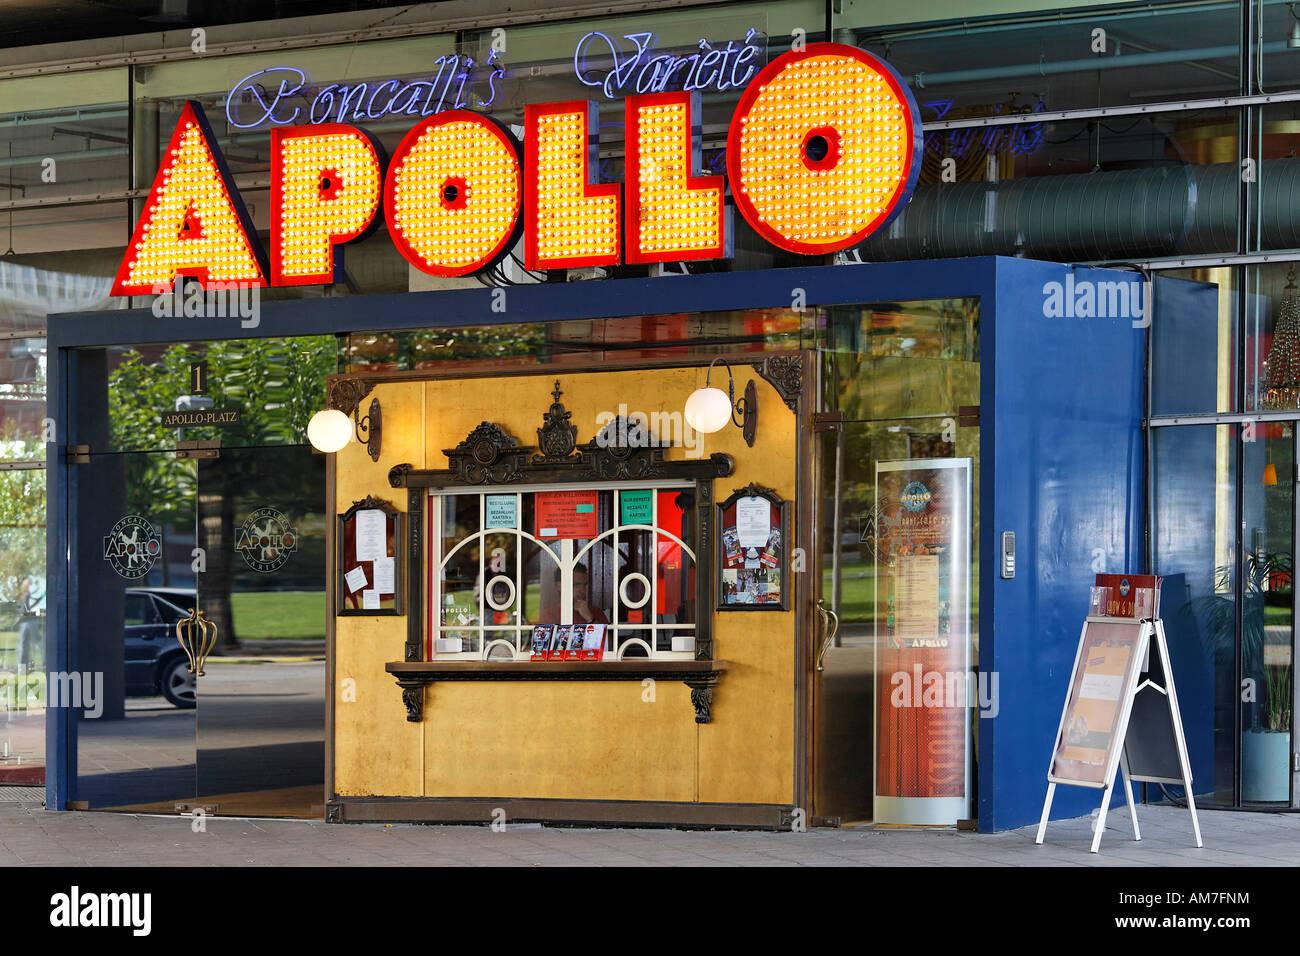 Variety theater Apollo, Duesseldorf, NRW, Germany Stock Photo